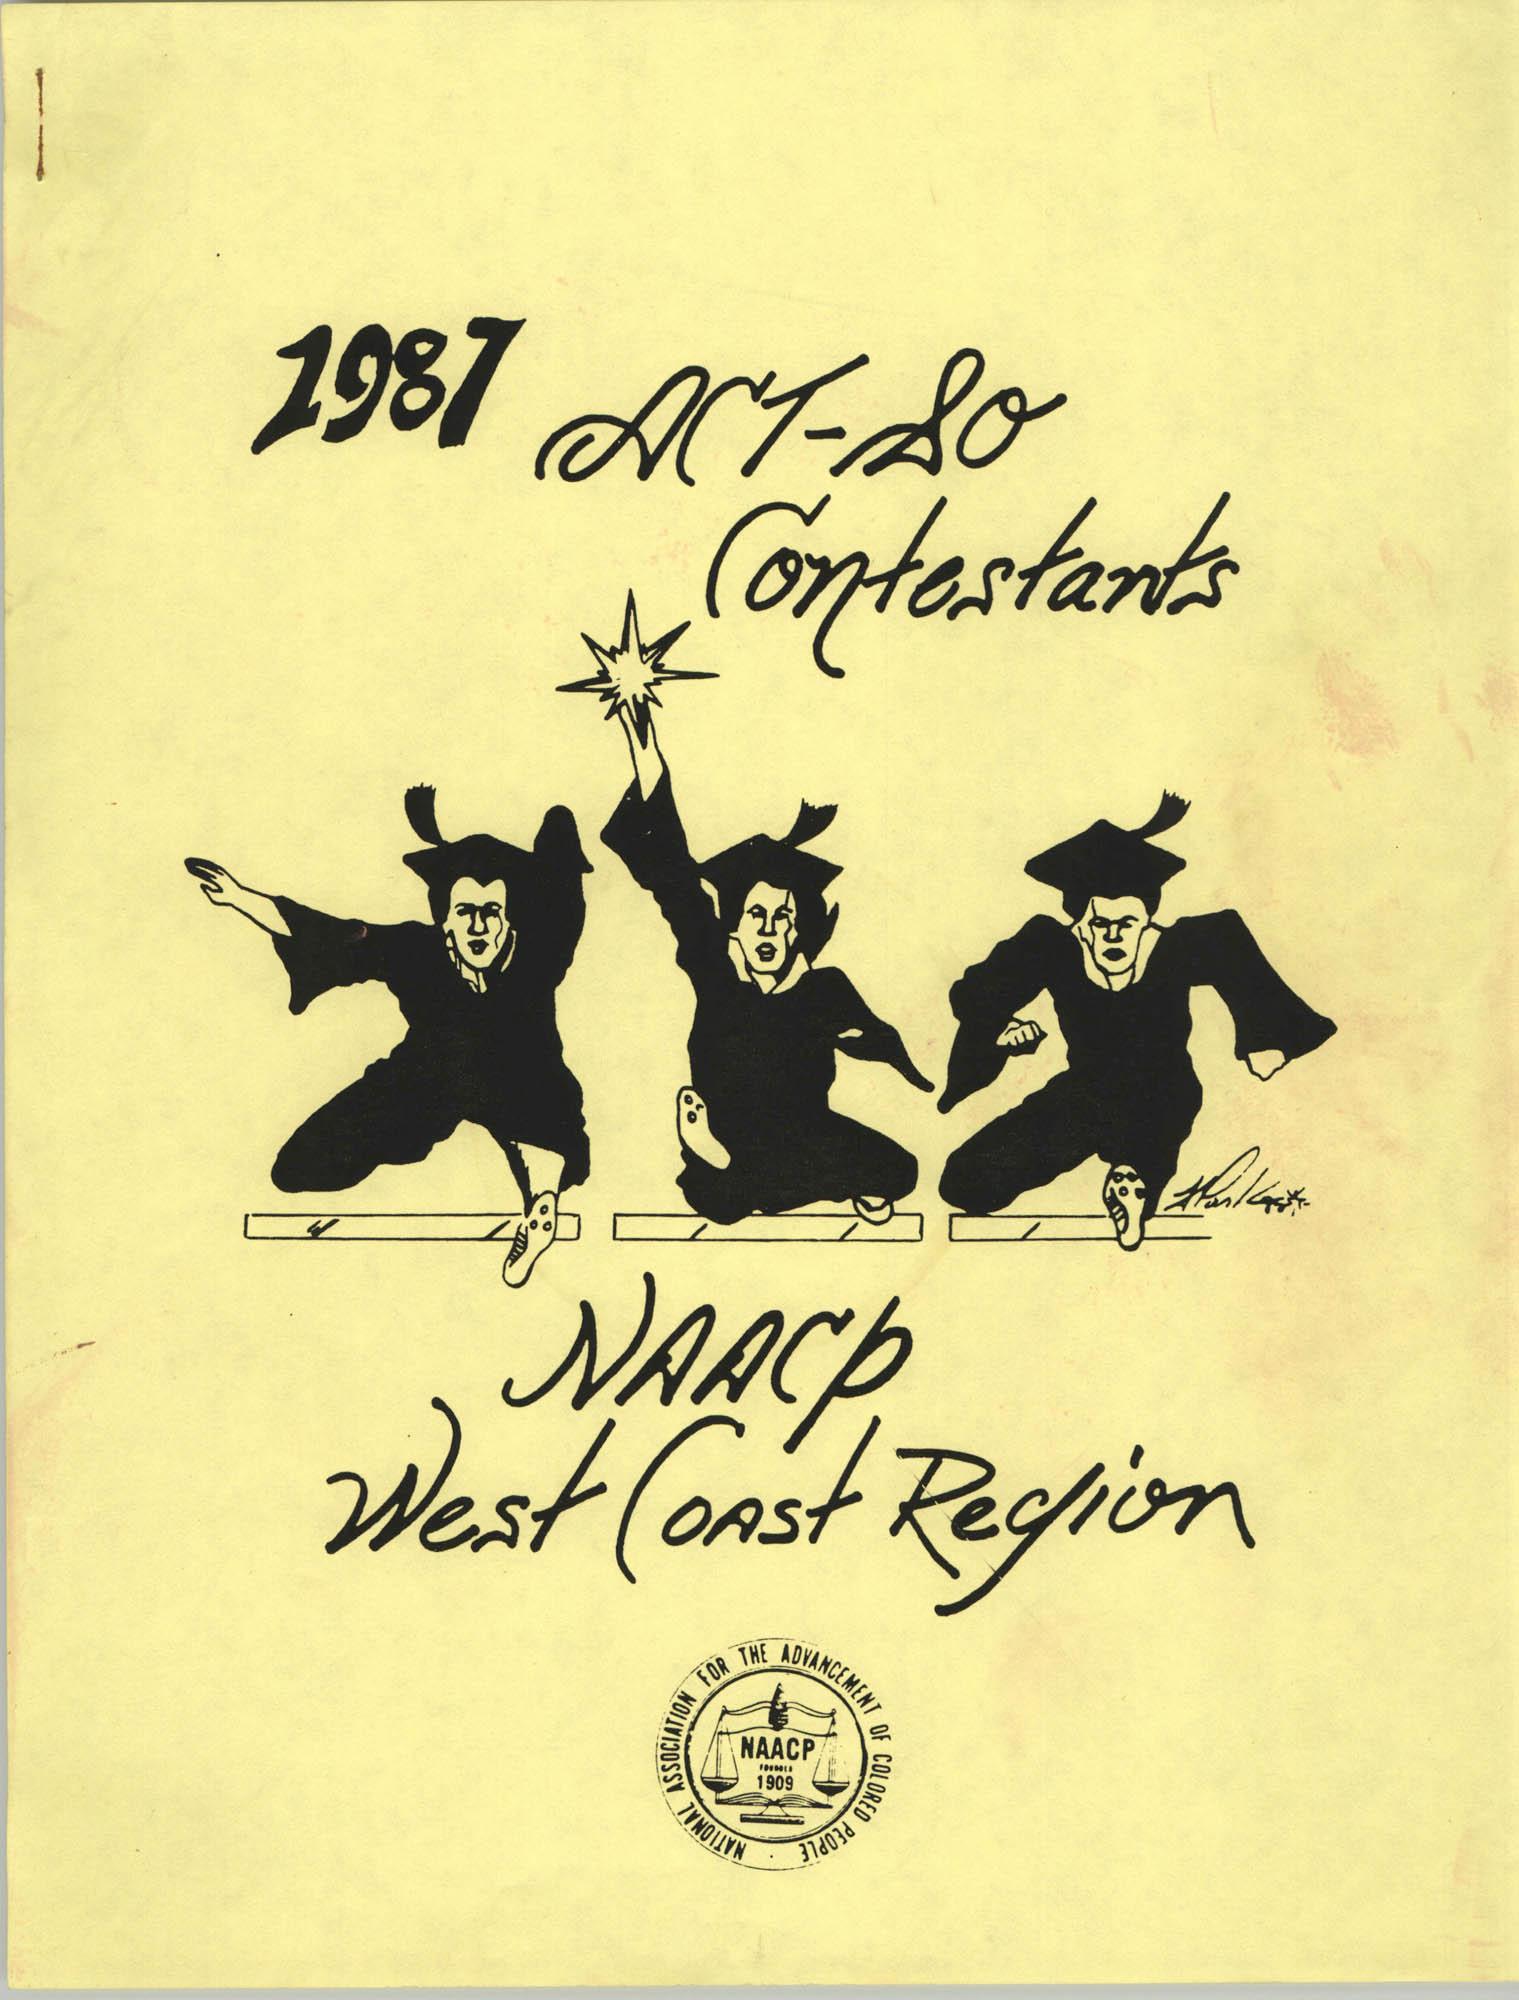 1987 Act-So Contestants, NAACP West Coast Region